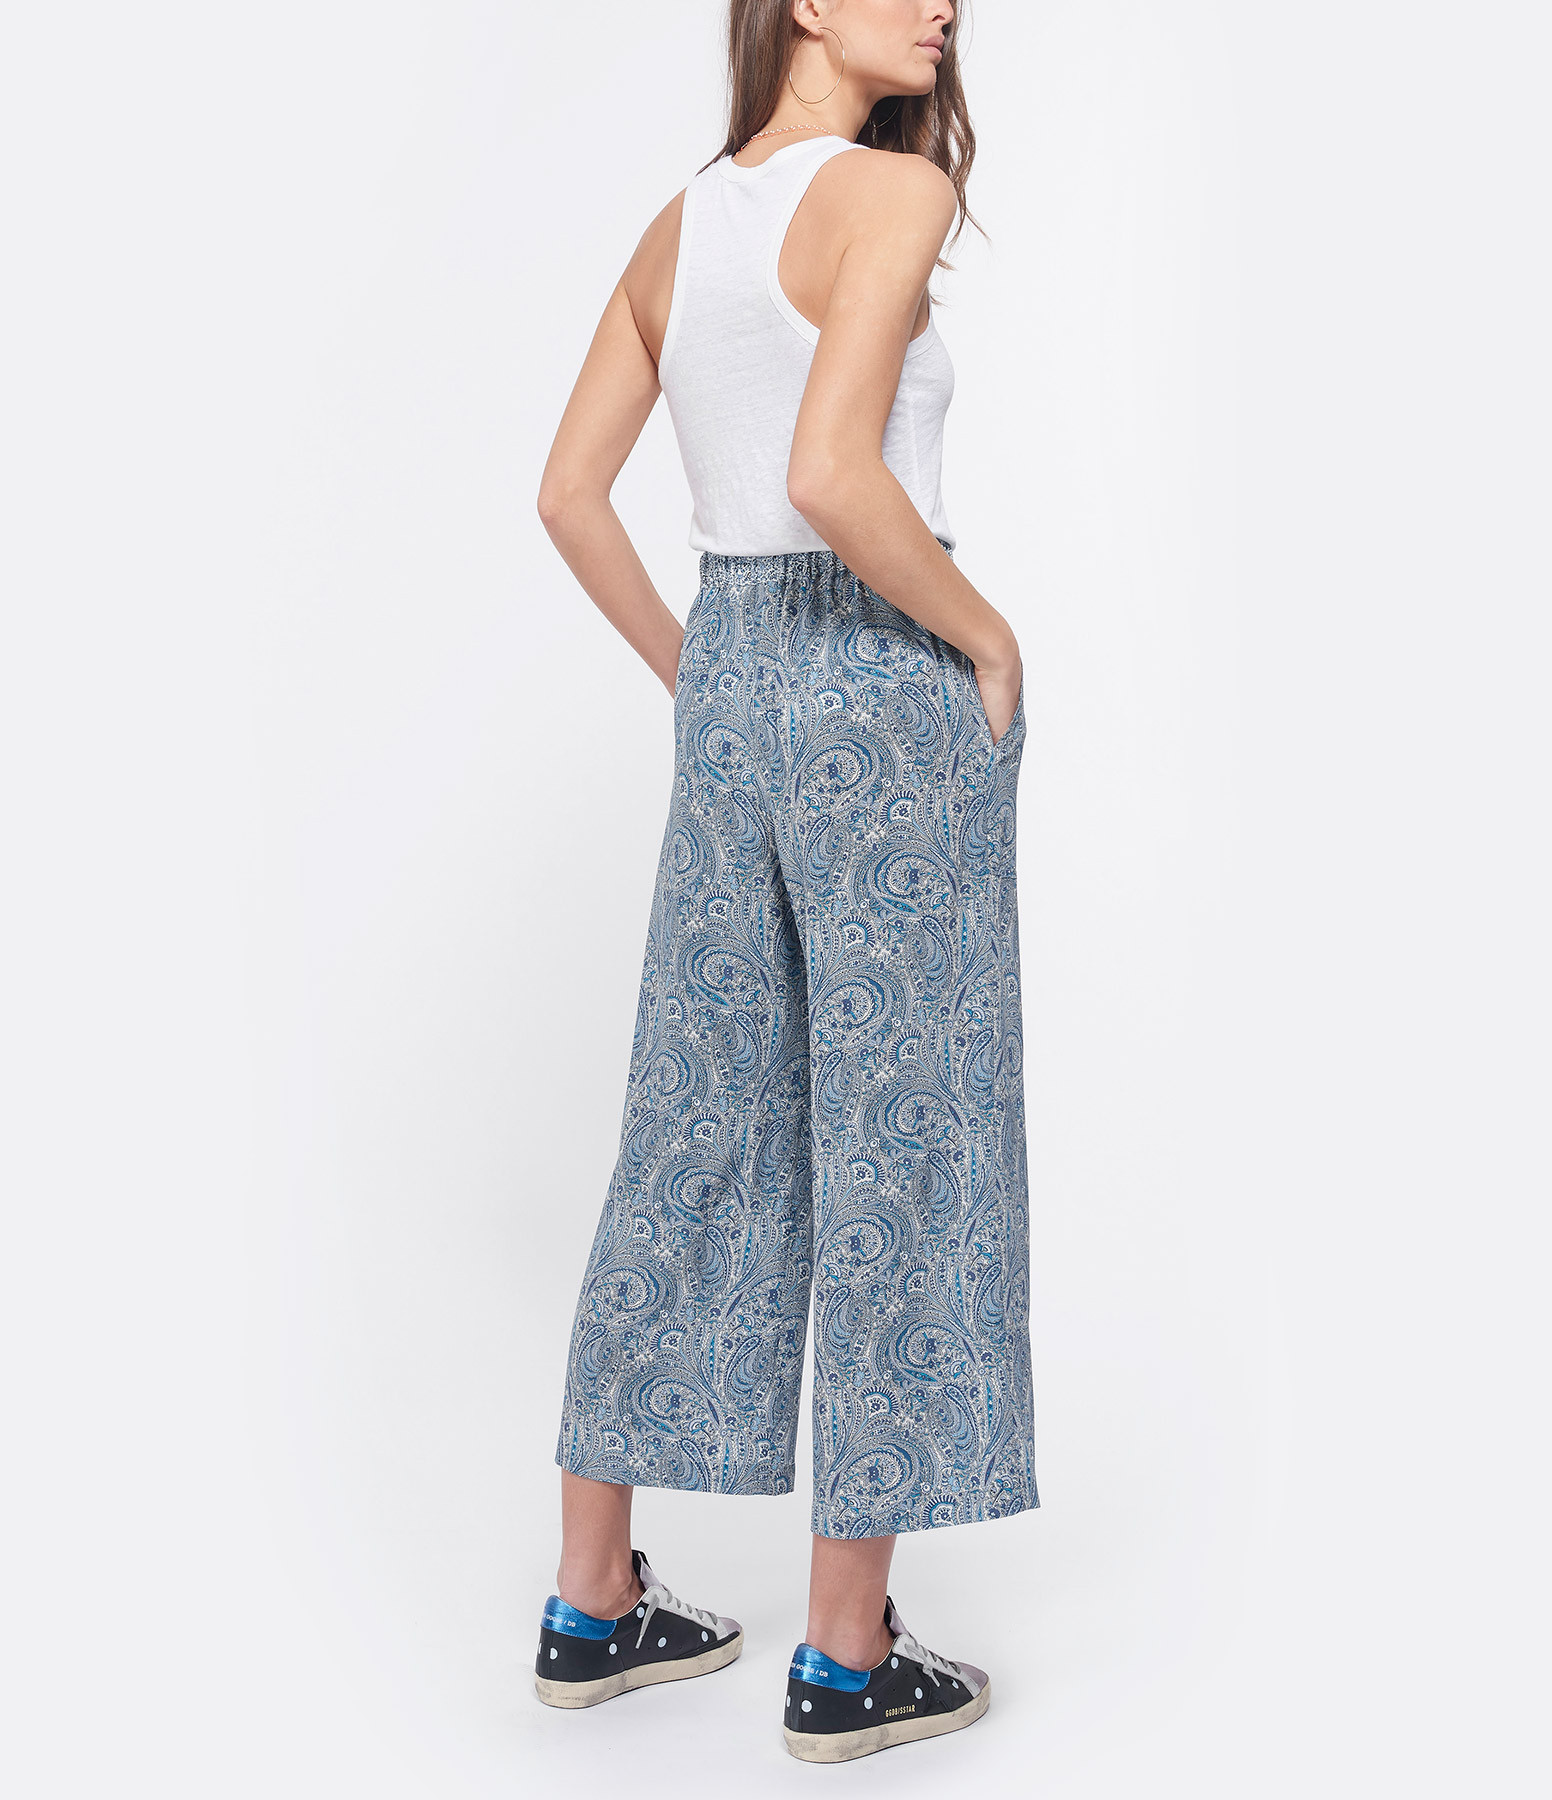 VANESSA BRUNO - Pantalon Lyor Bleu Royal